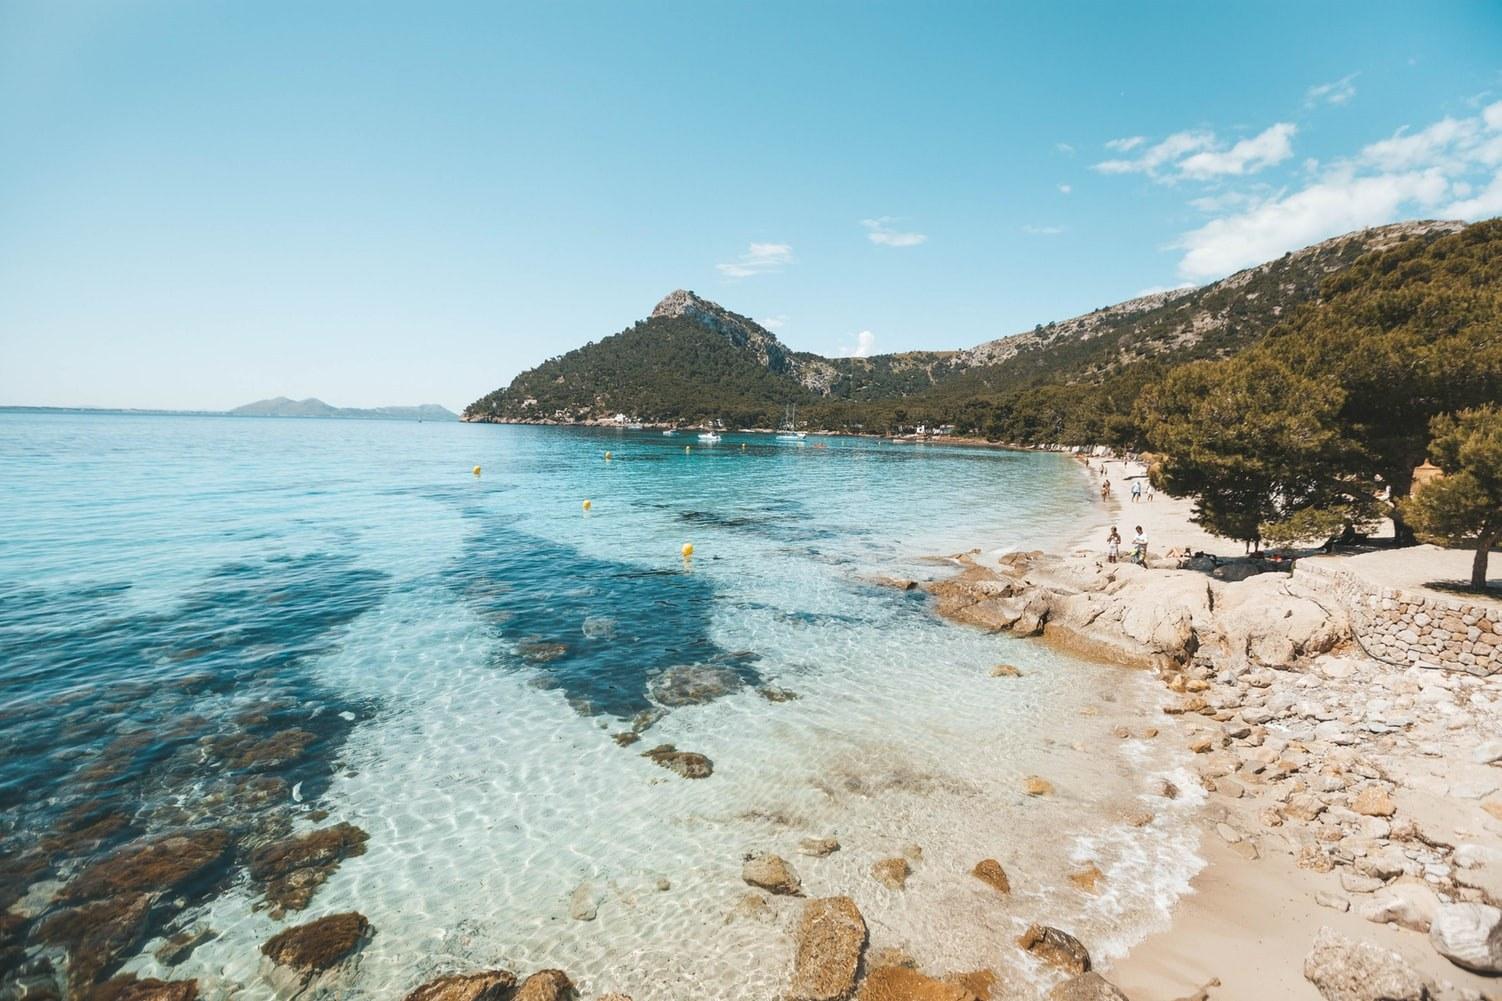 THE BALEARIC ISLANDS: EACH BALEARIC ISLAND A TOURISTIC HOTSPOT IN THE MEDITERRANEAN